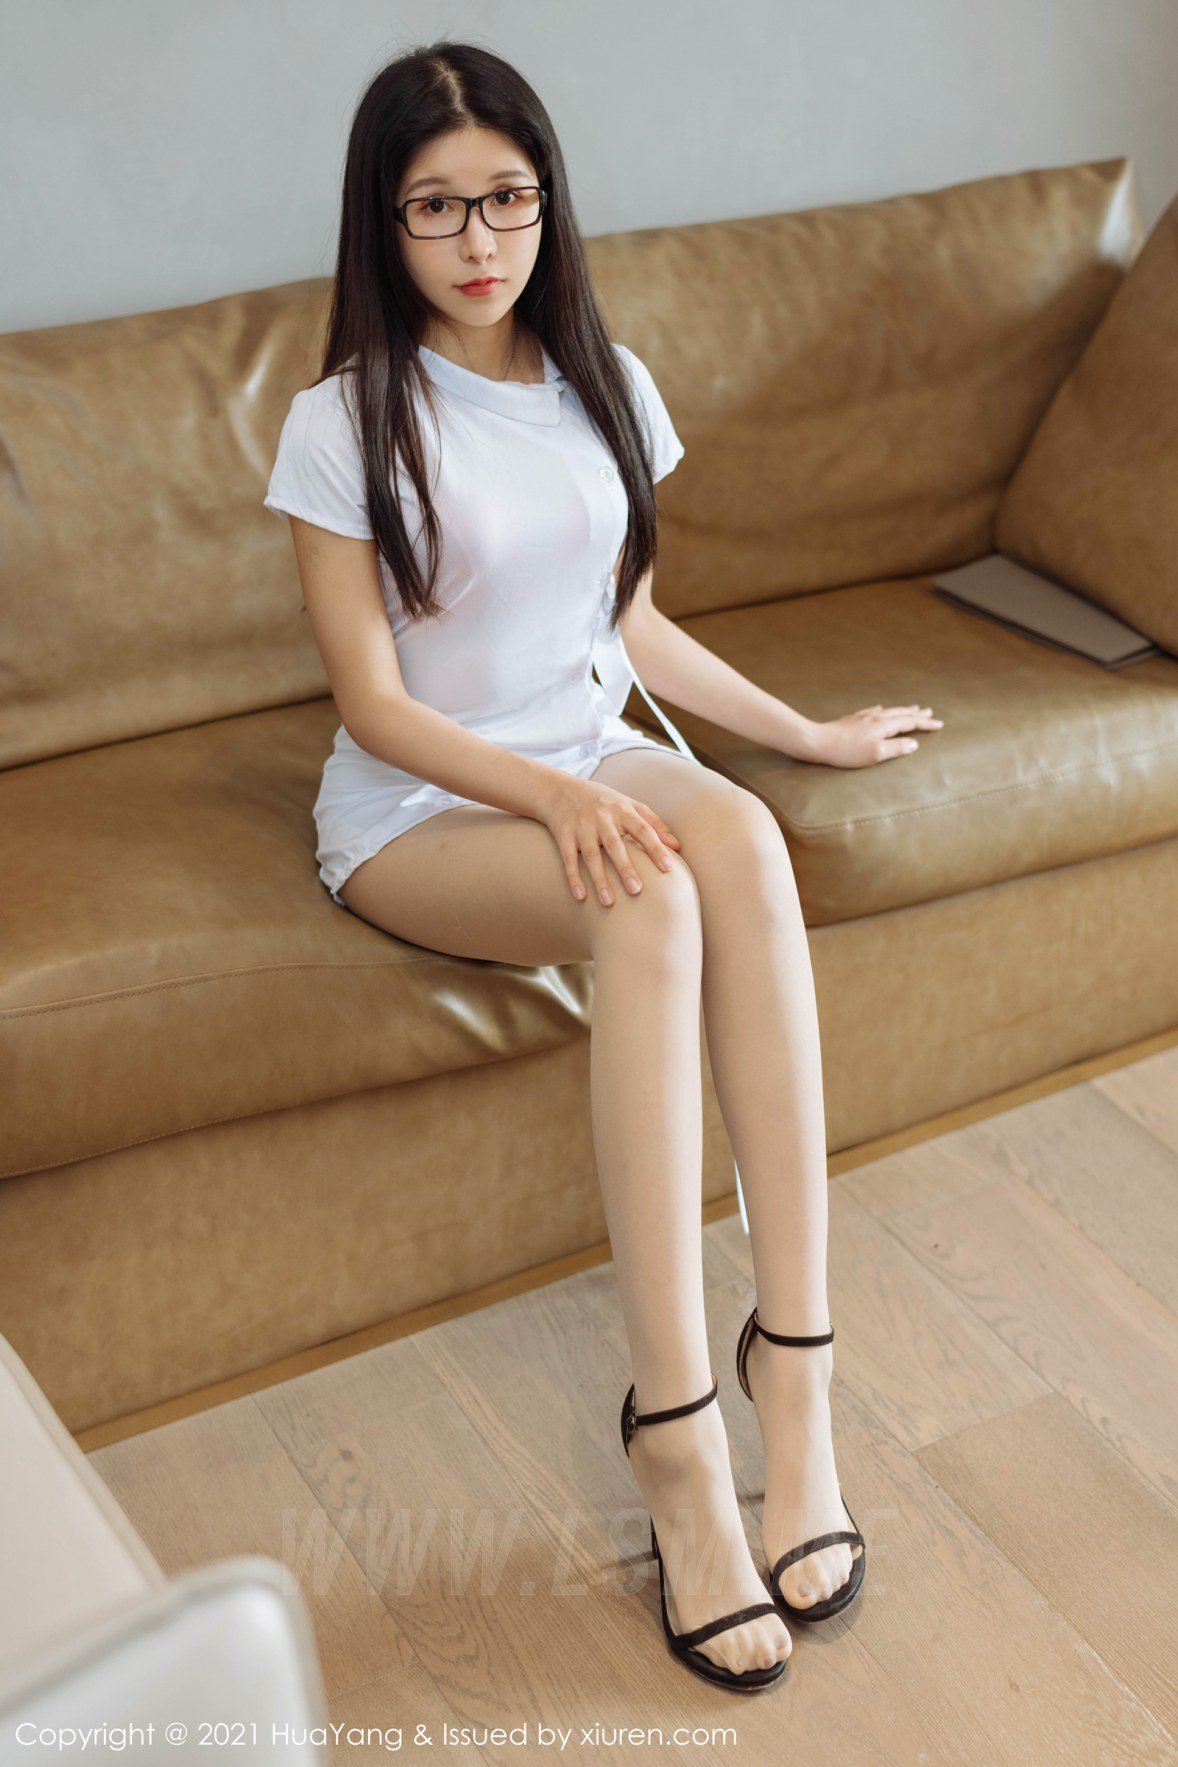 HuaYang 花漾show Vol.389 衬衣眼镜OL 奥莉 朦胧丝袜 - 1